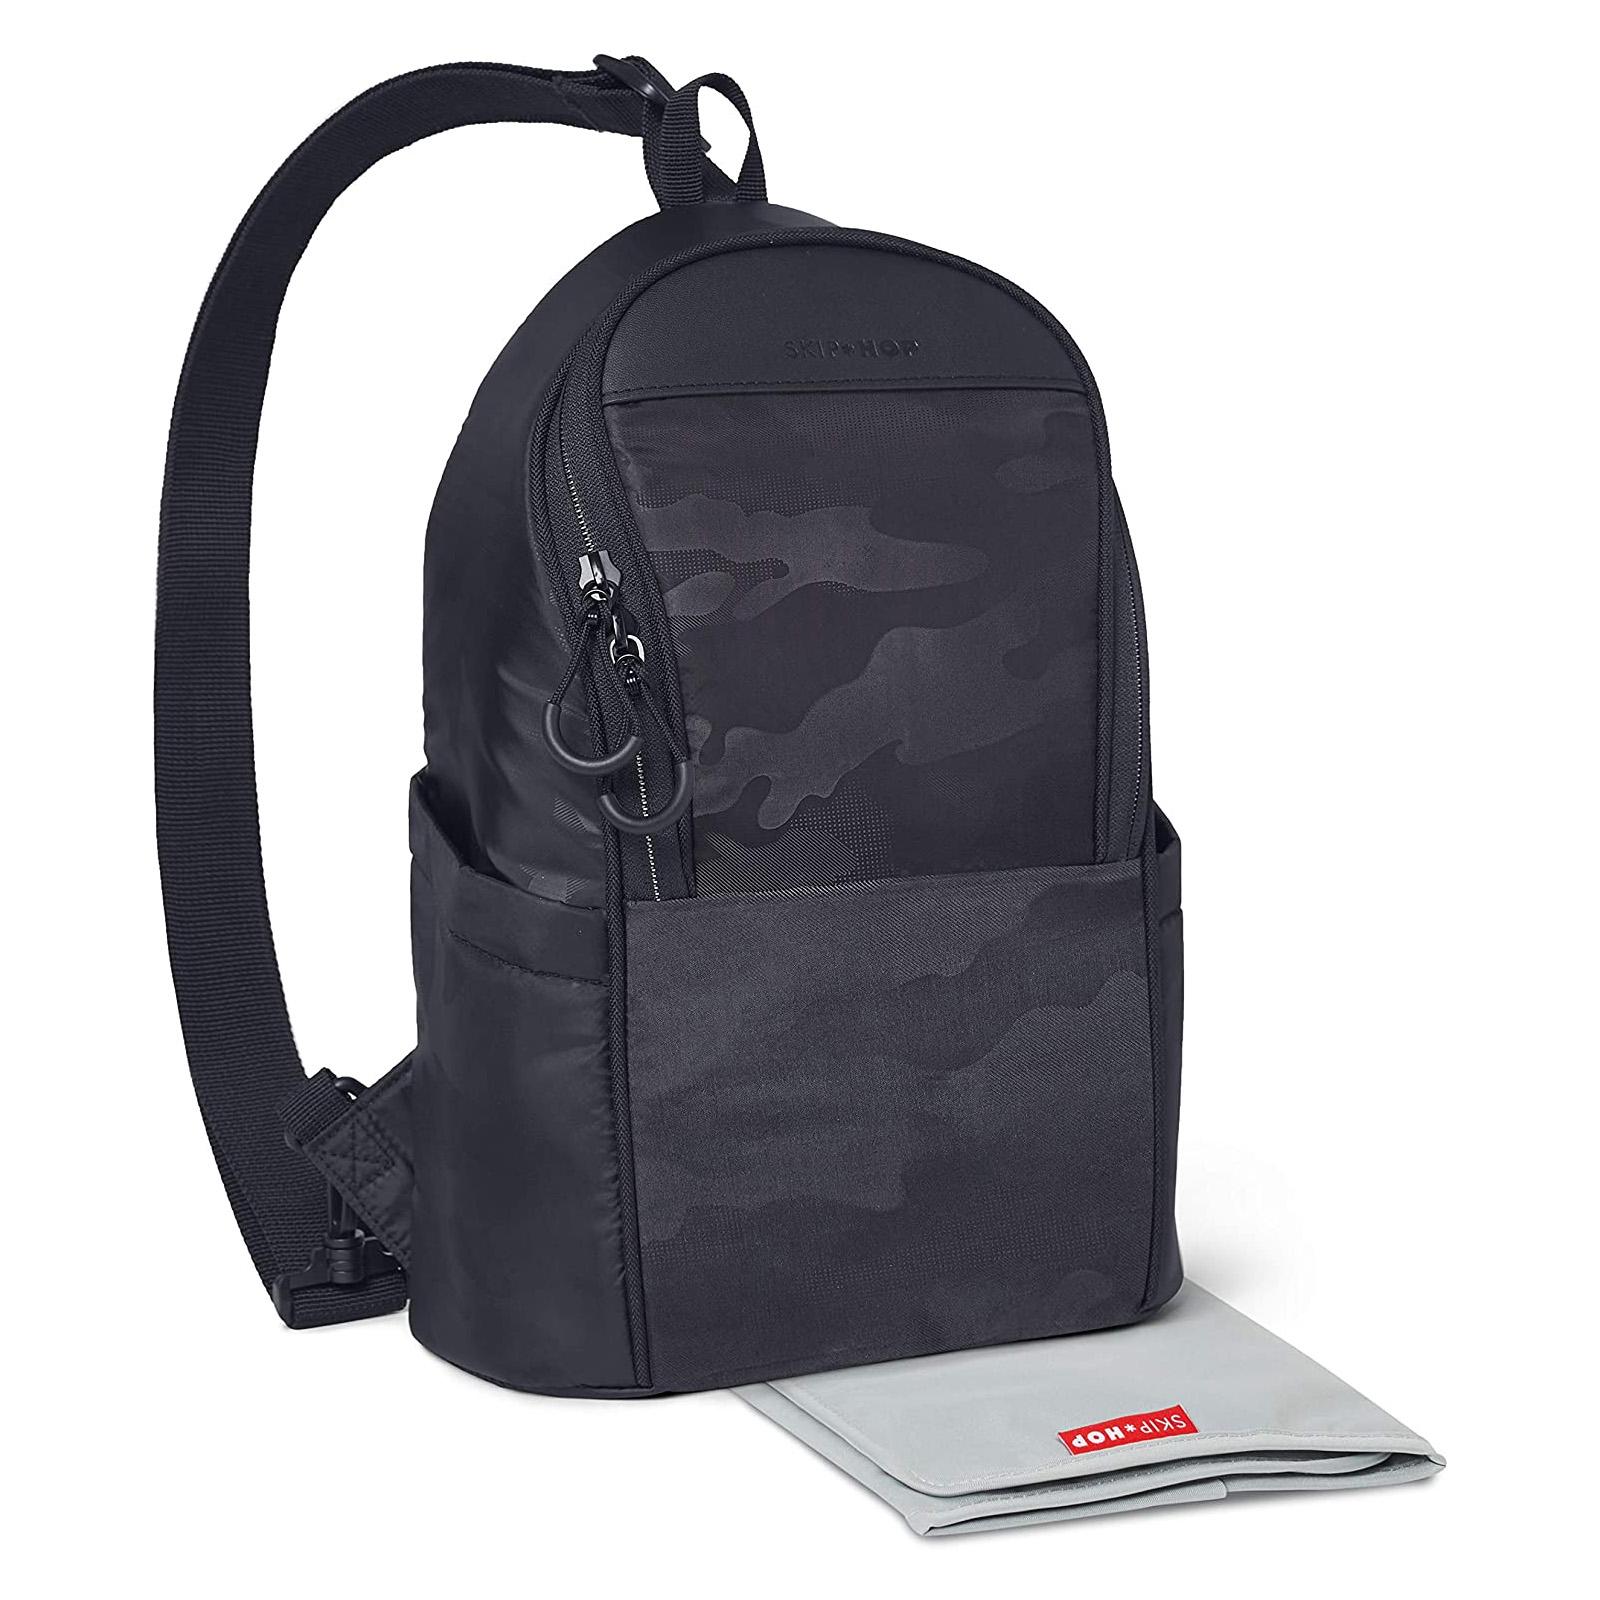 Skip Hop Paxwell Easy access sling backpack changing bag for £17.90 delivered @ Online4Baby